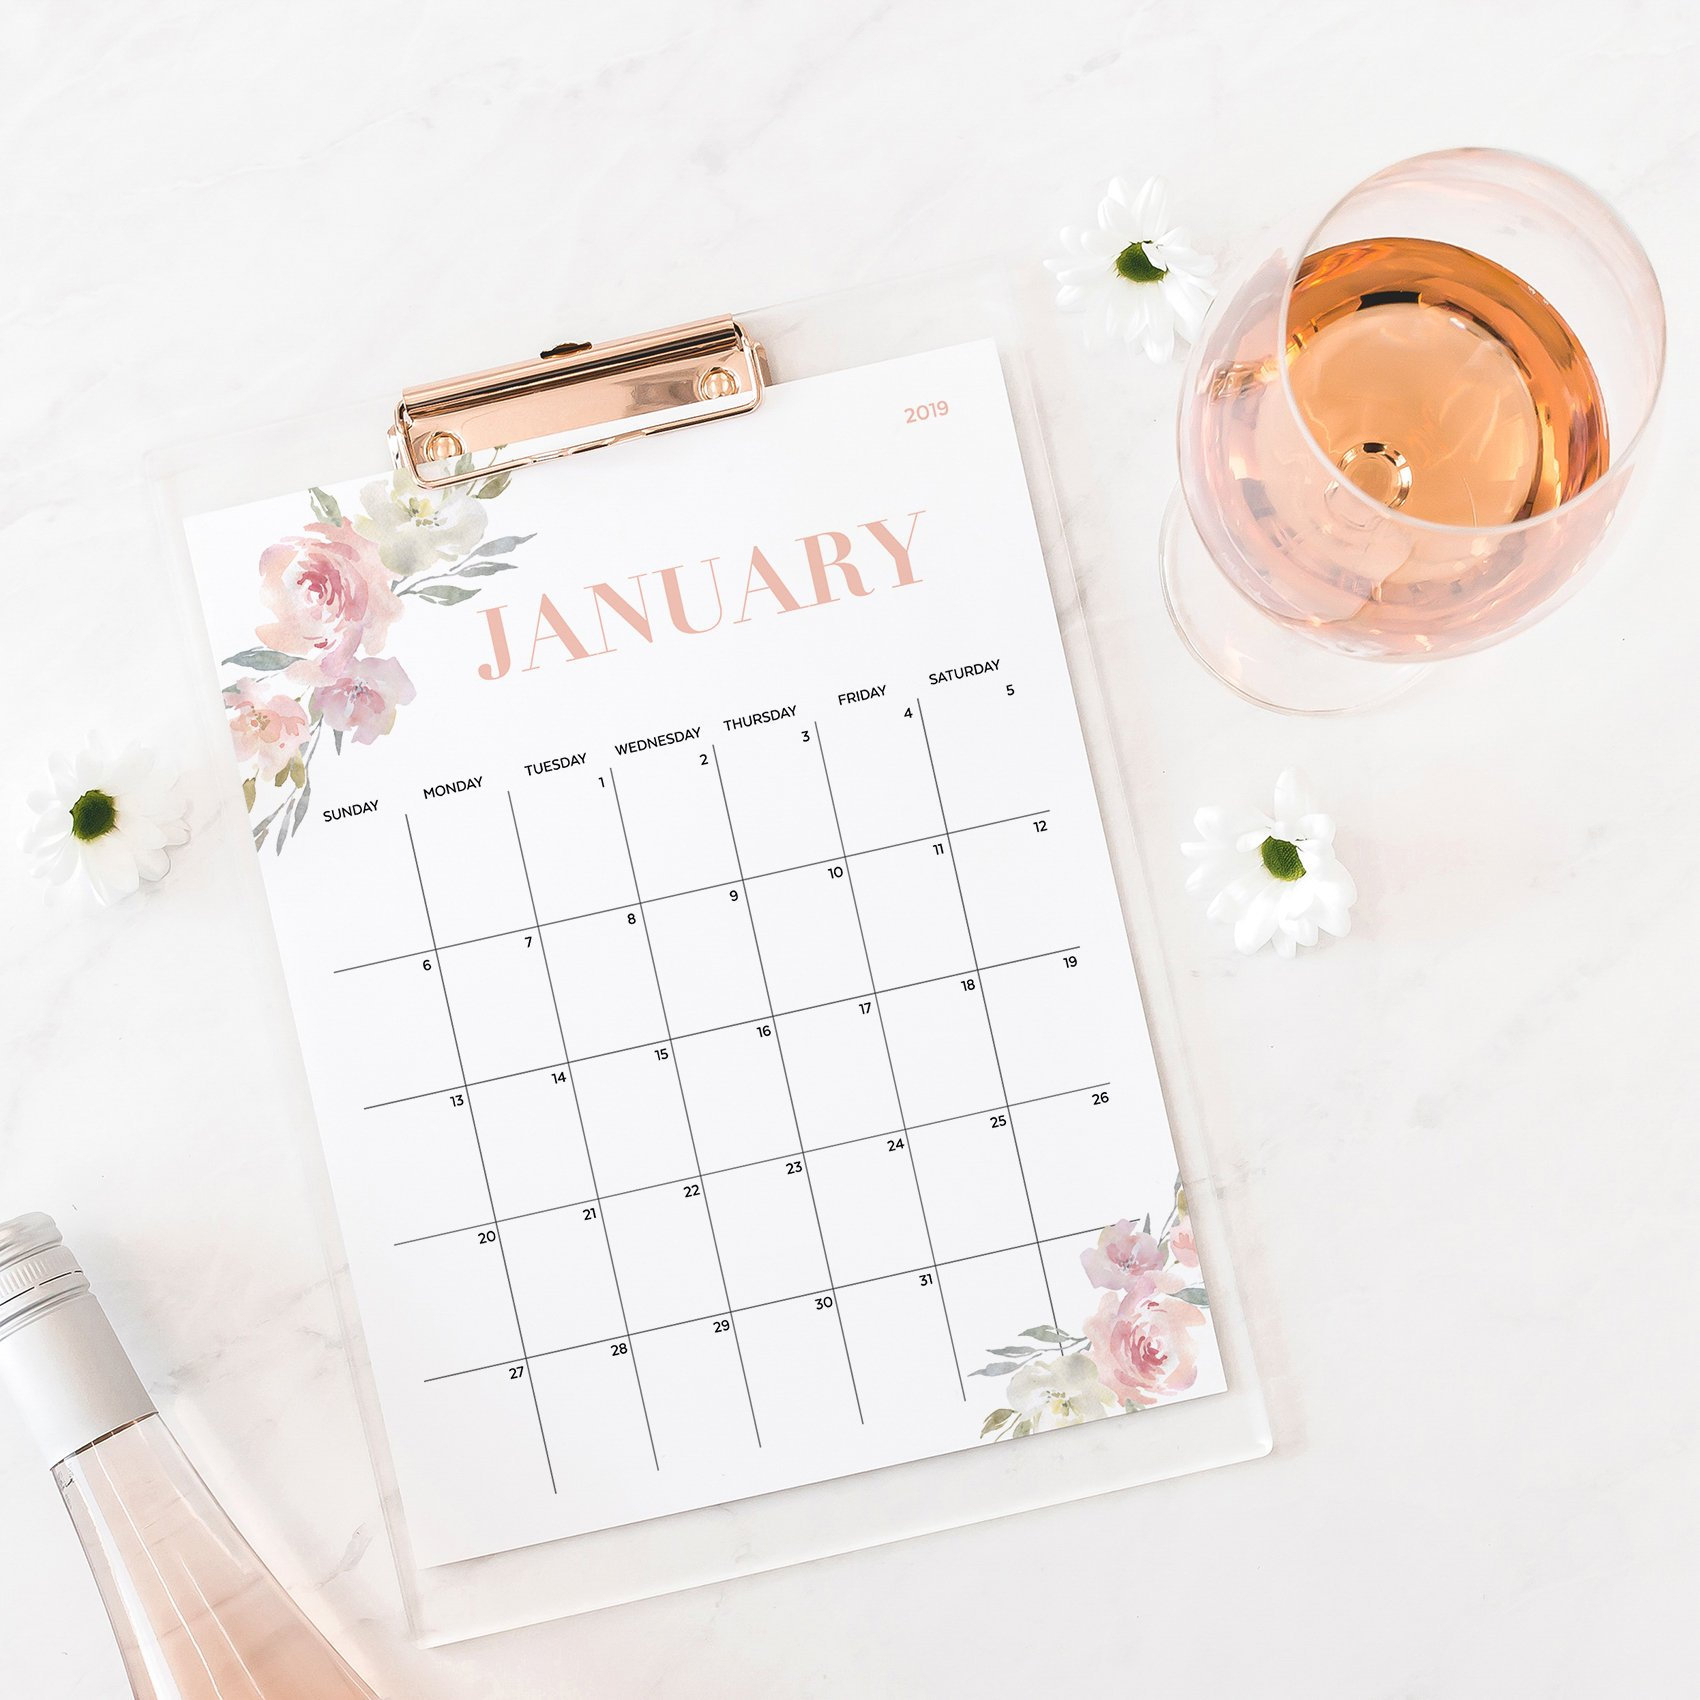 2019 Wall Calendar Printable, 2019 Printable Calendar 2019 Printable,  Floral 2019 Monthly Calendar Printable 2019, 2019 Desk Calendar with Cvs Desk Calendar